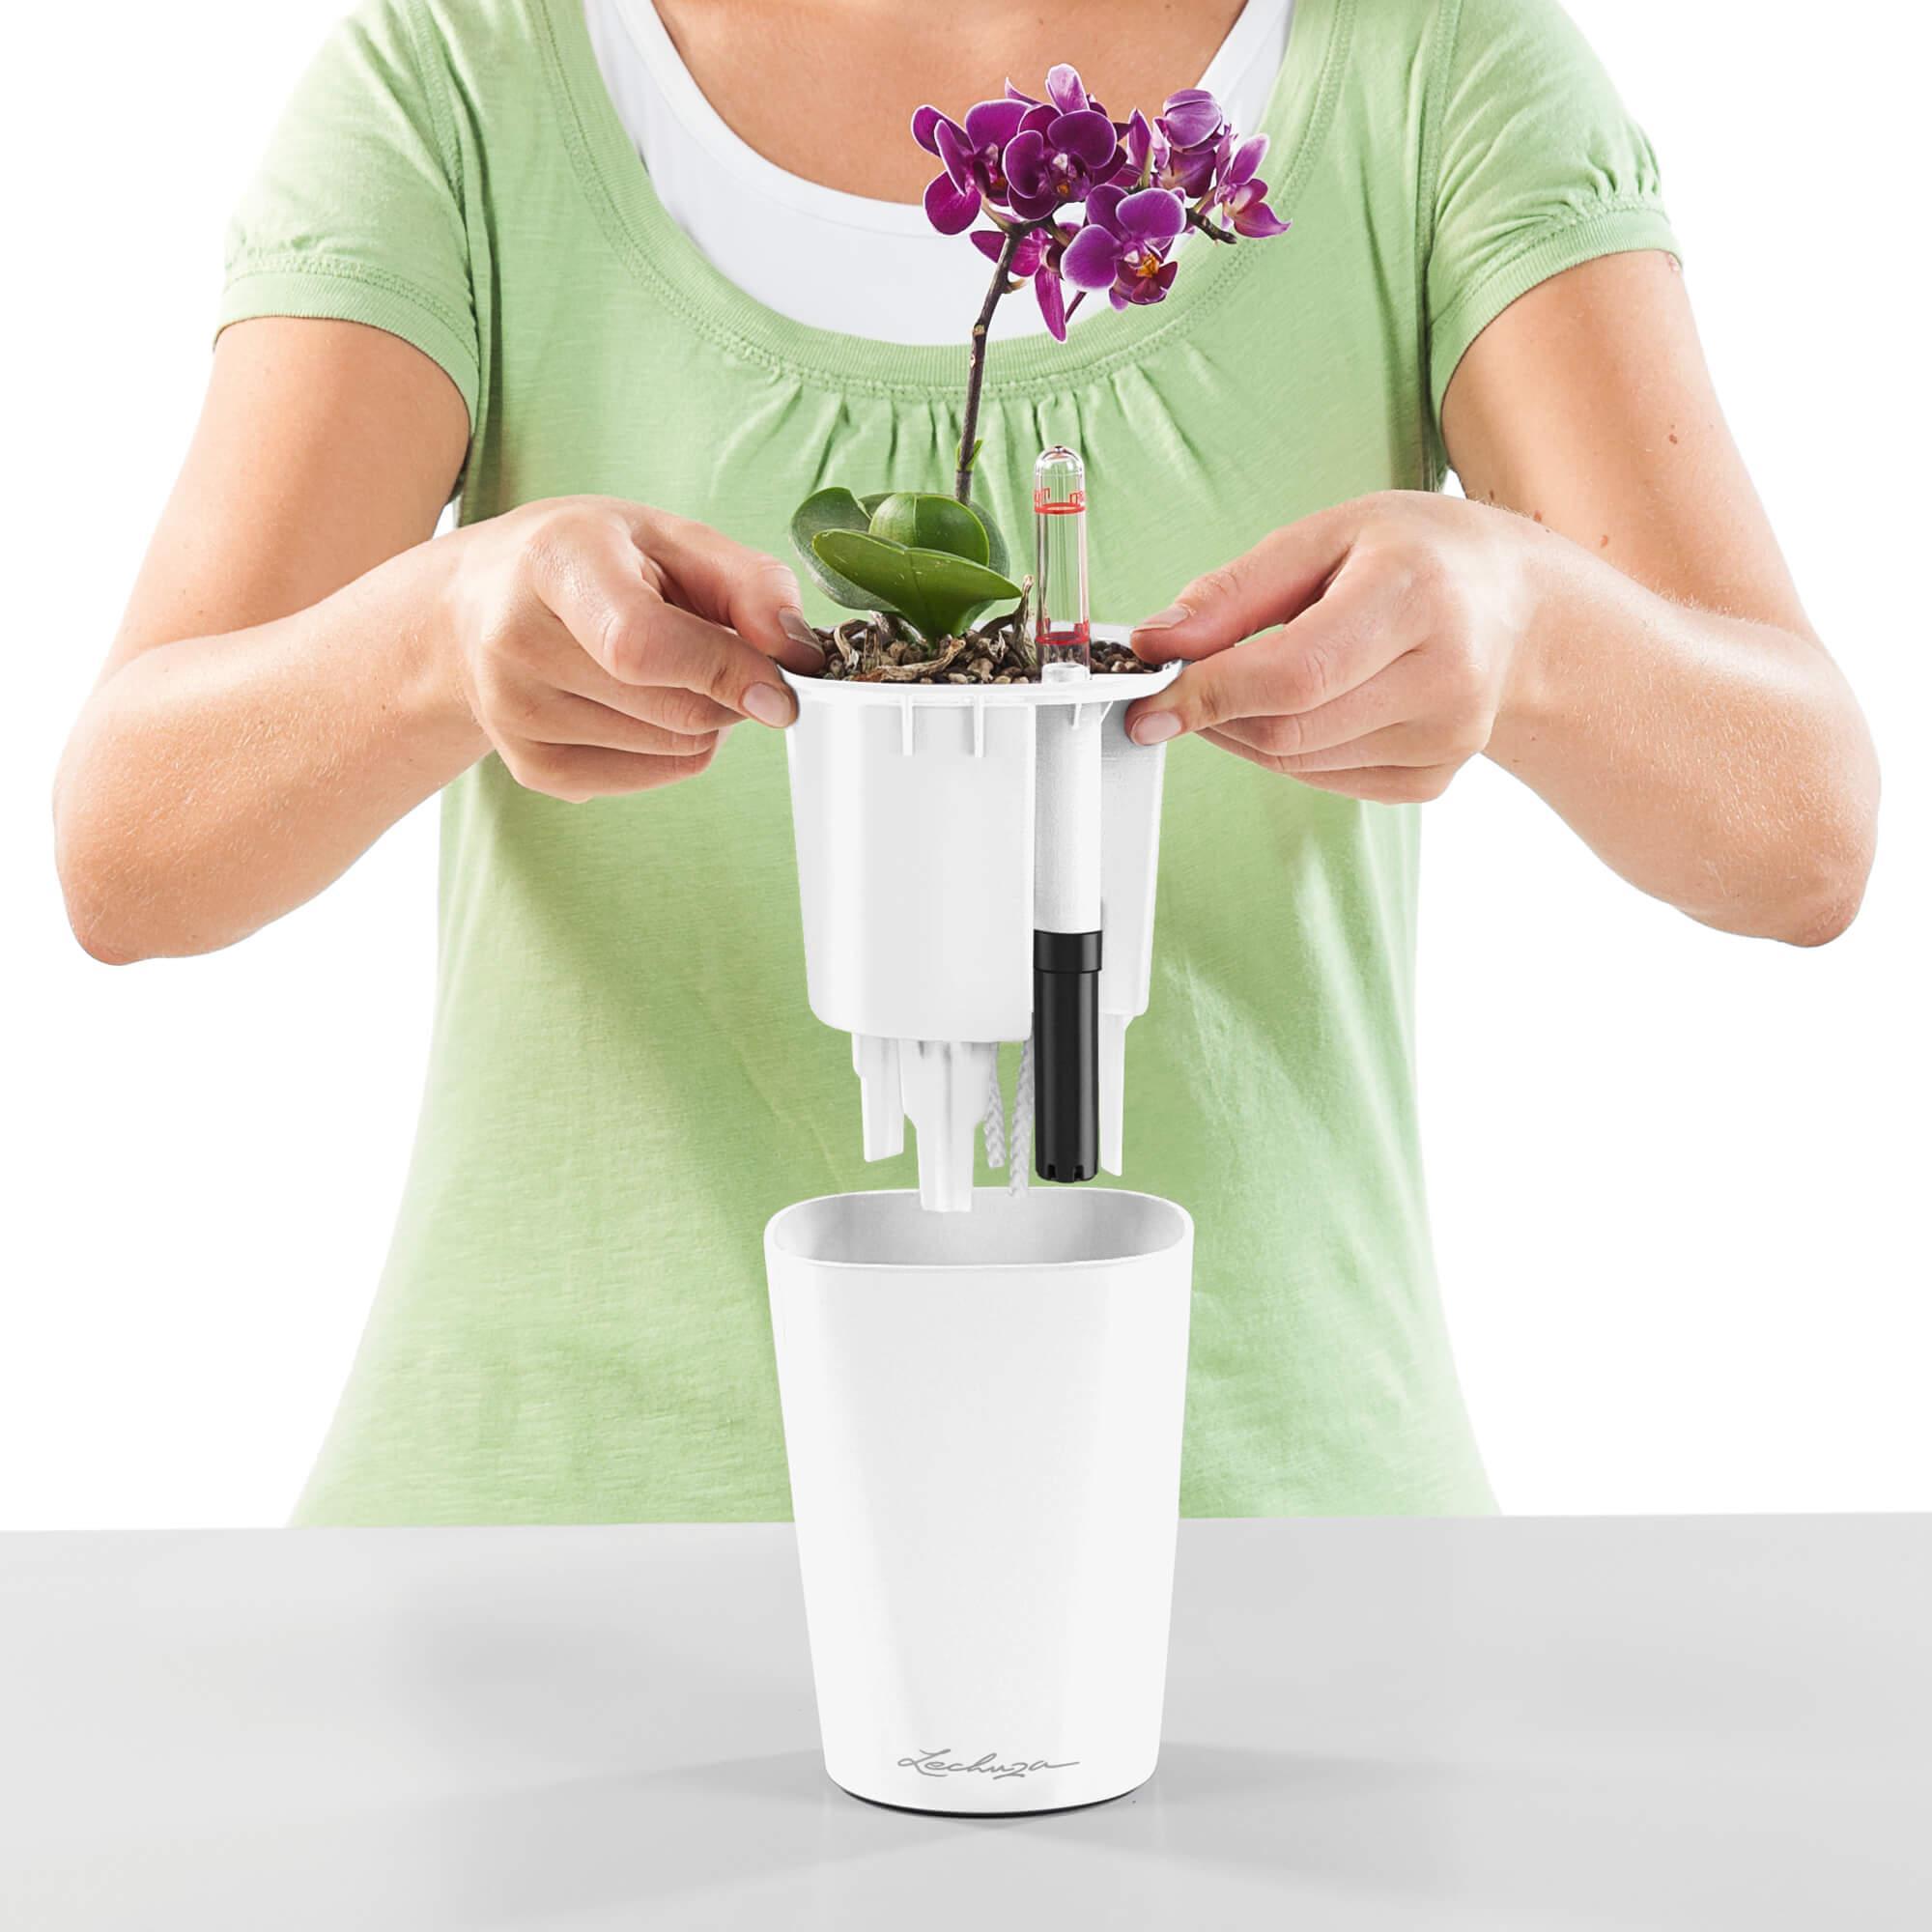 MINI-DELTINI violet pastel brillant - Image 2